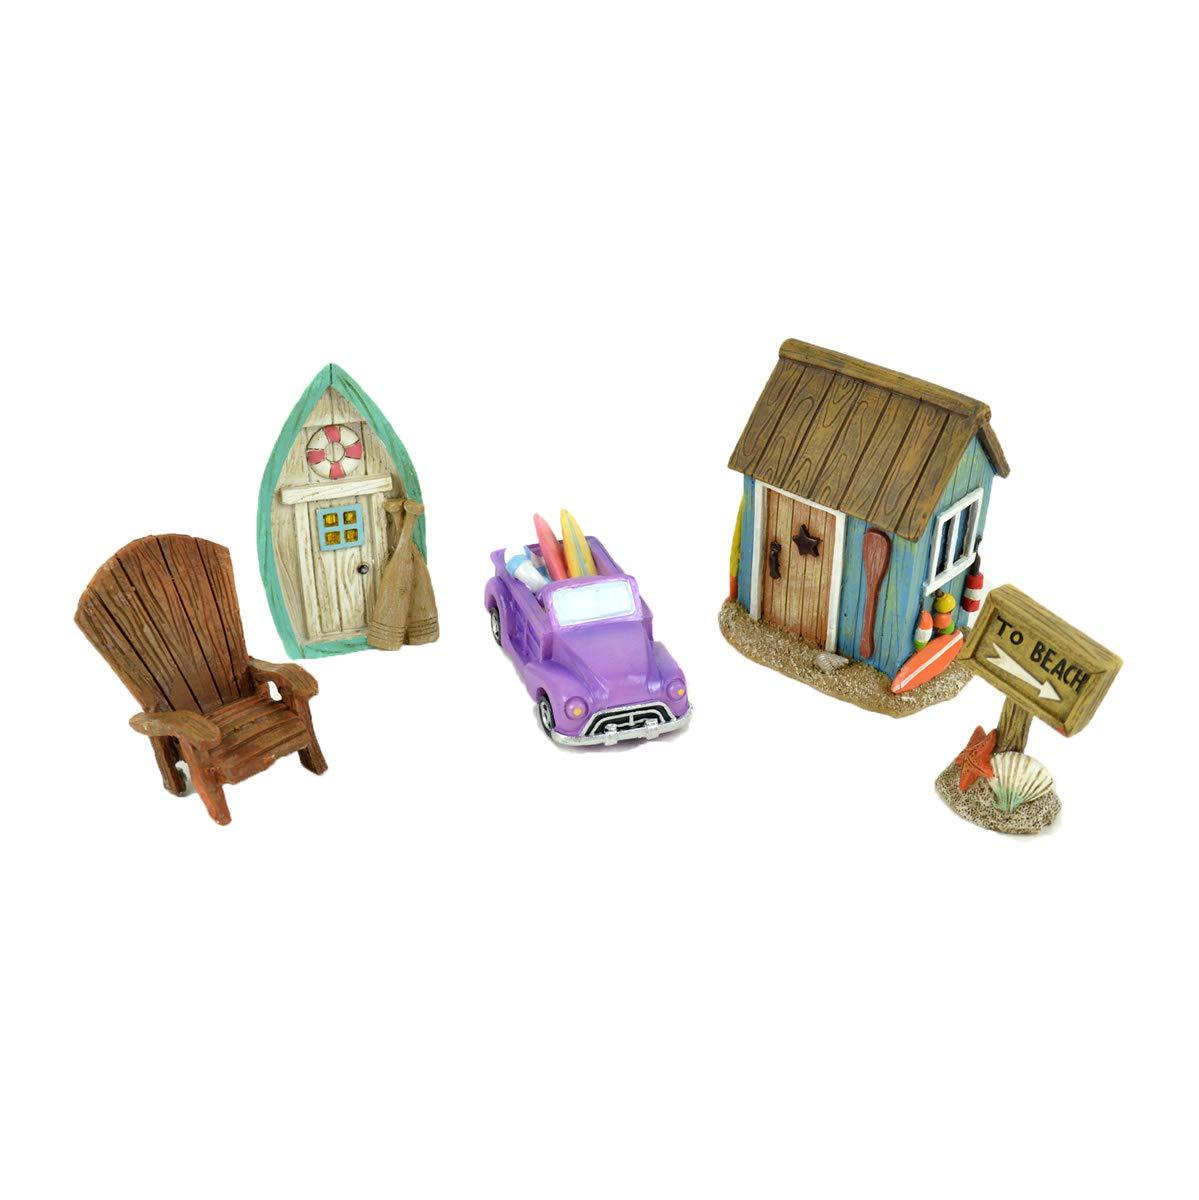 Midwest Design Imports, Inc. Miniature 5 pc Beach Fairy Garden Kit - Chair, Beach Hut, Mini Car, Sign, and Rowboat Door